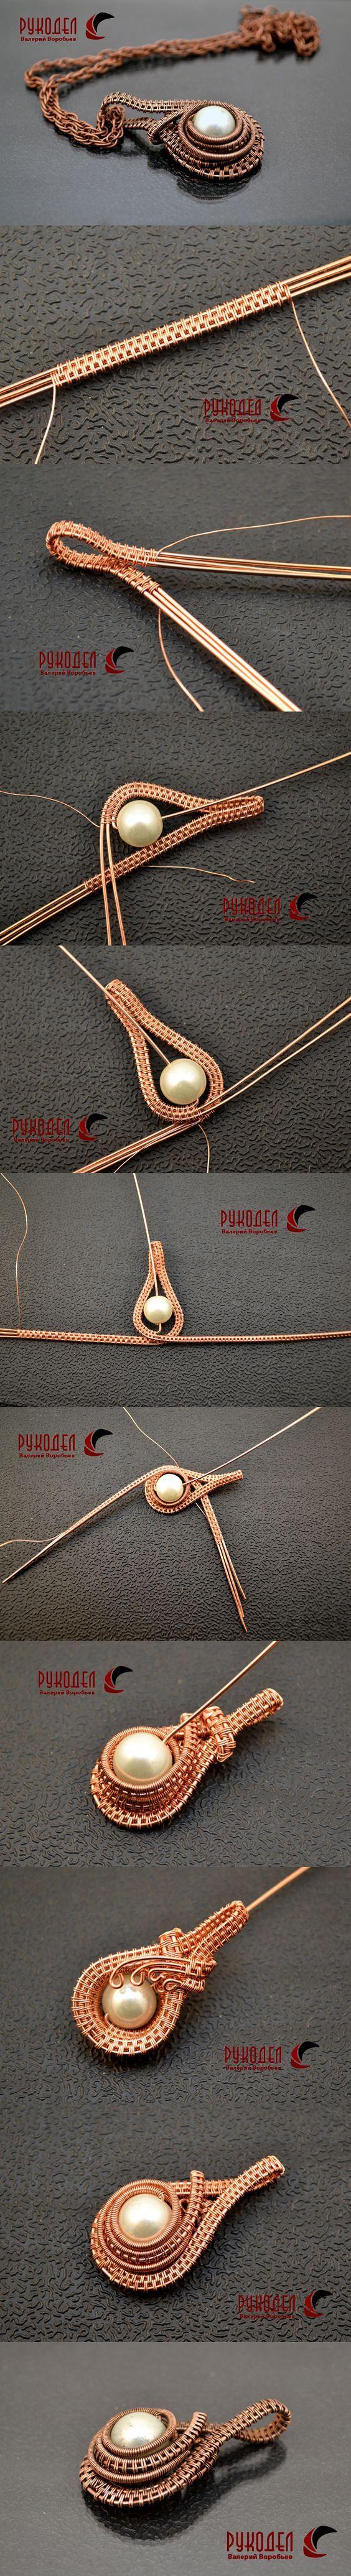 Wire Wrap Pendant. Подвеска из проволоки с бусиной в технике Wire wrap.   Рукодел - http://magazin-rukodel.ru/